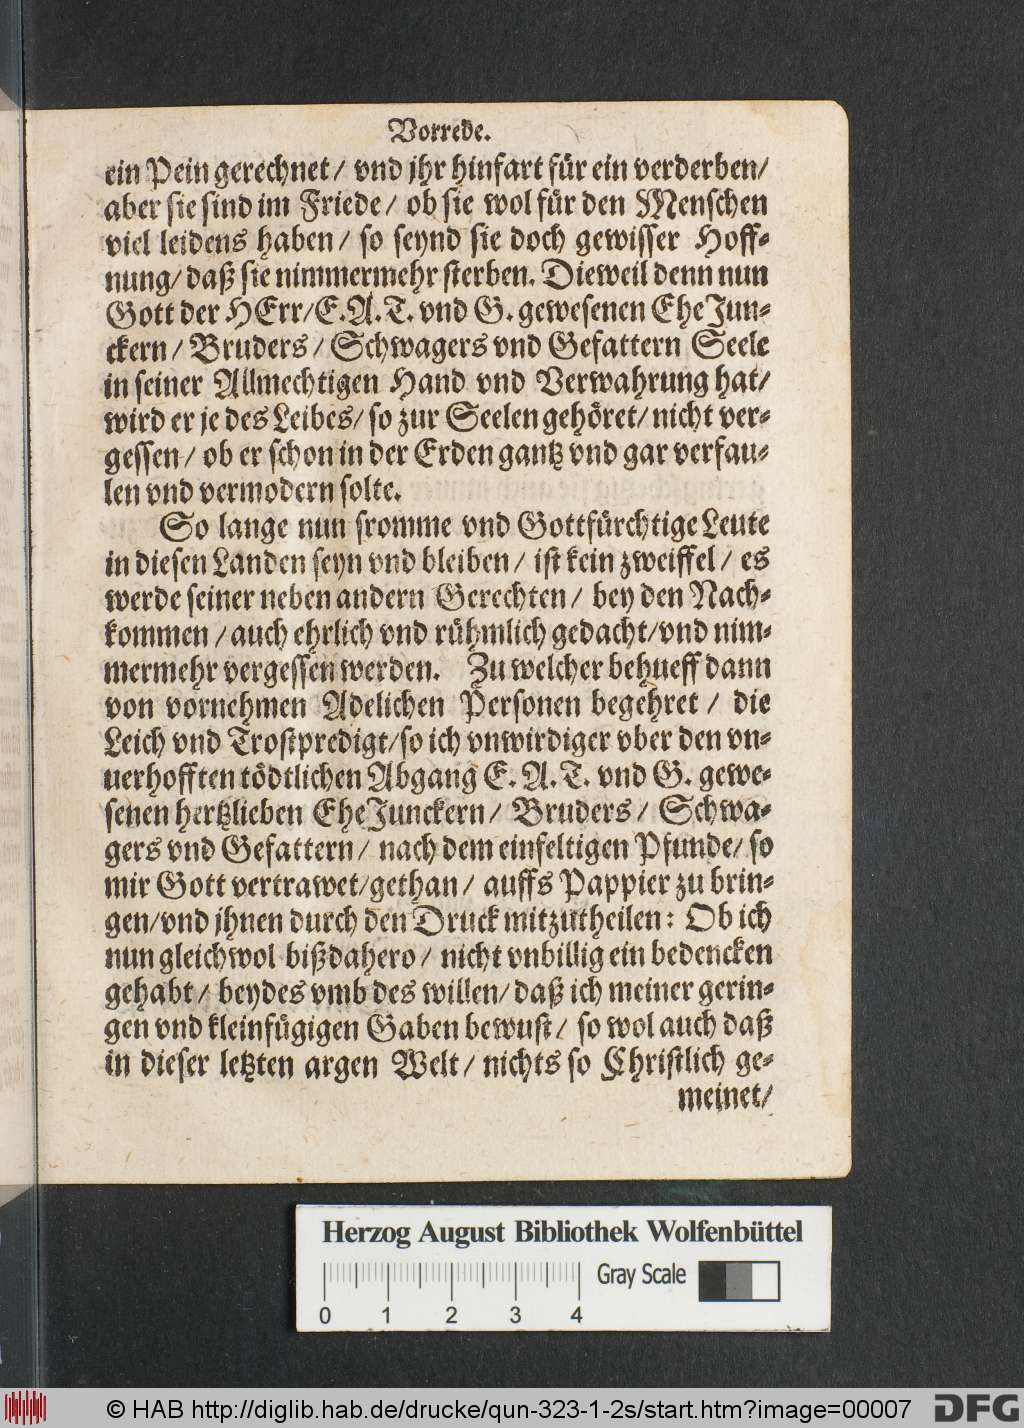 http://diglib.hab.de/drucke/qun-323-1-2s/00007.jpg